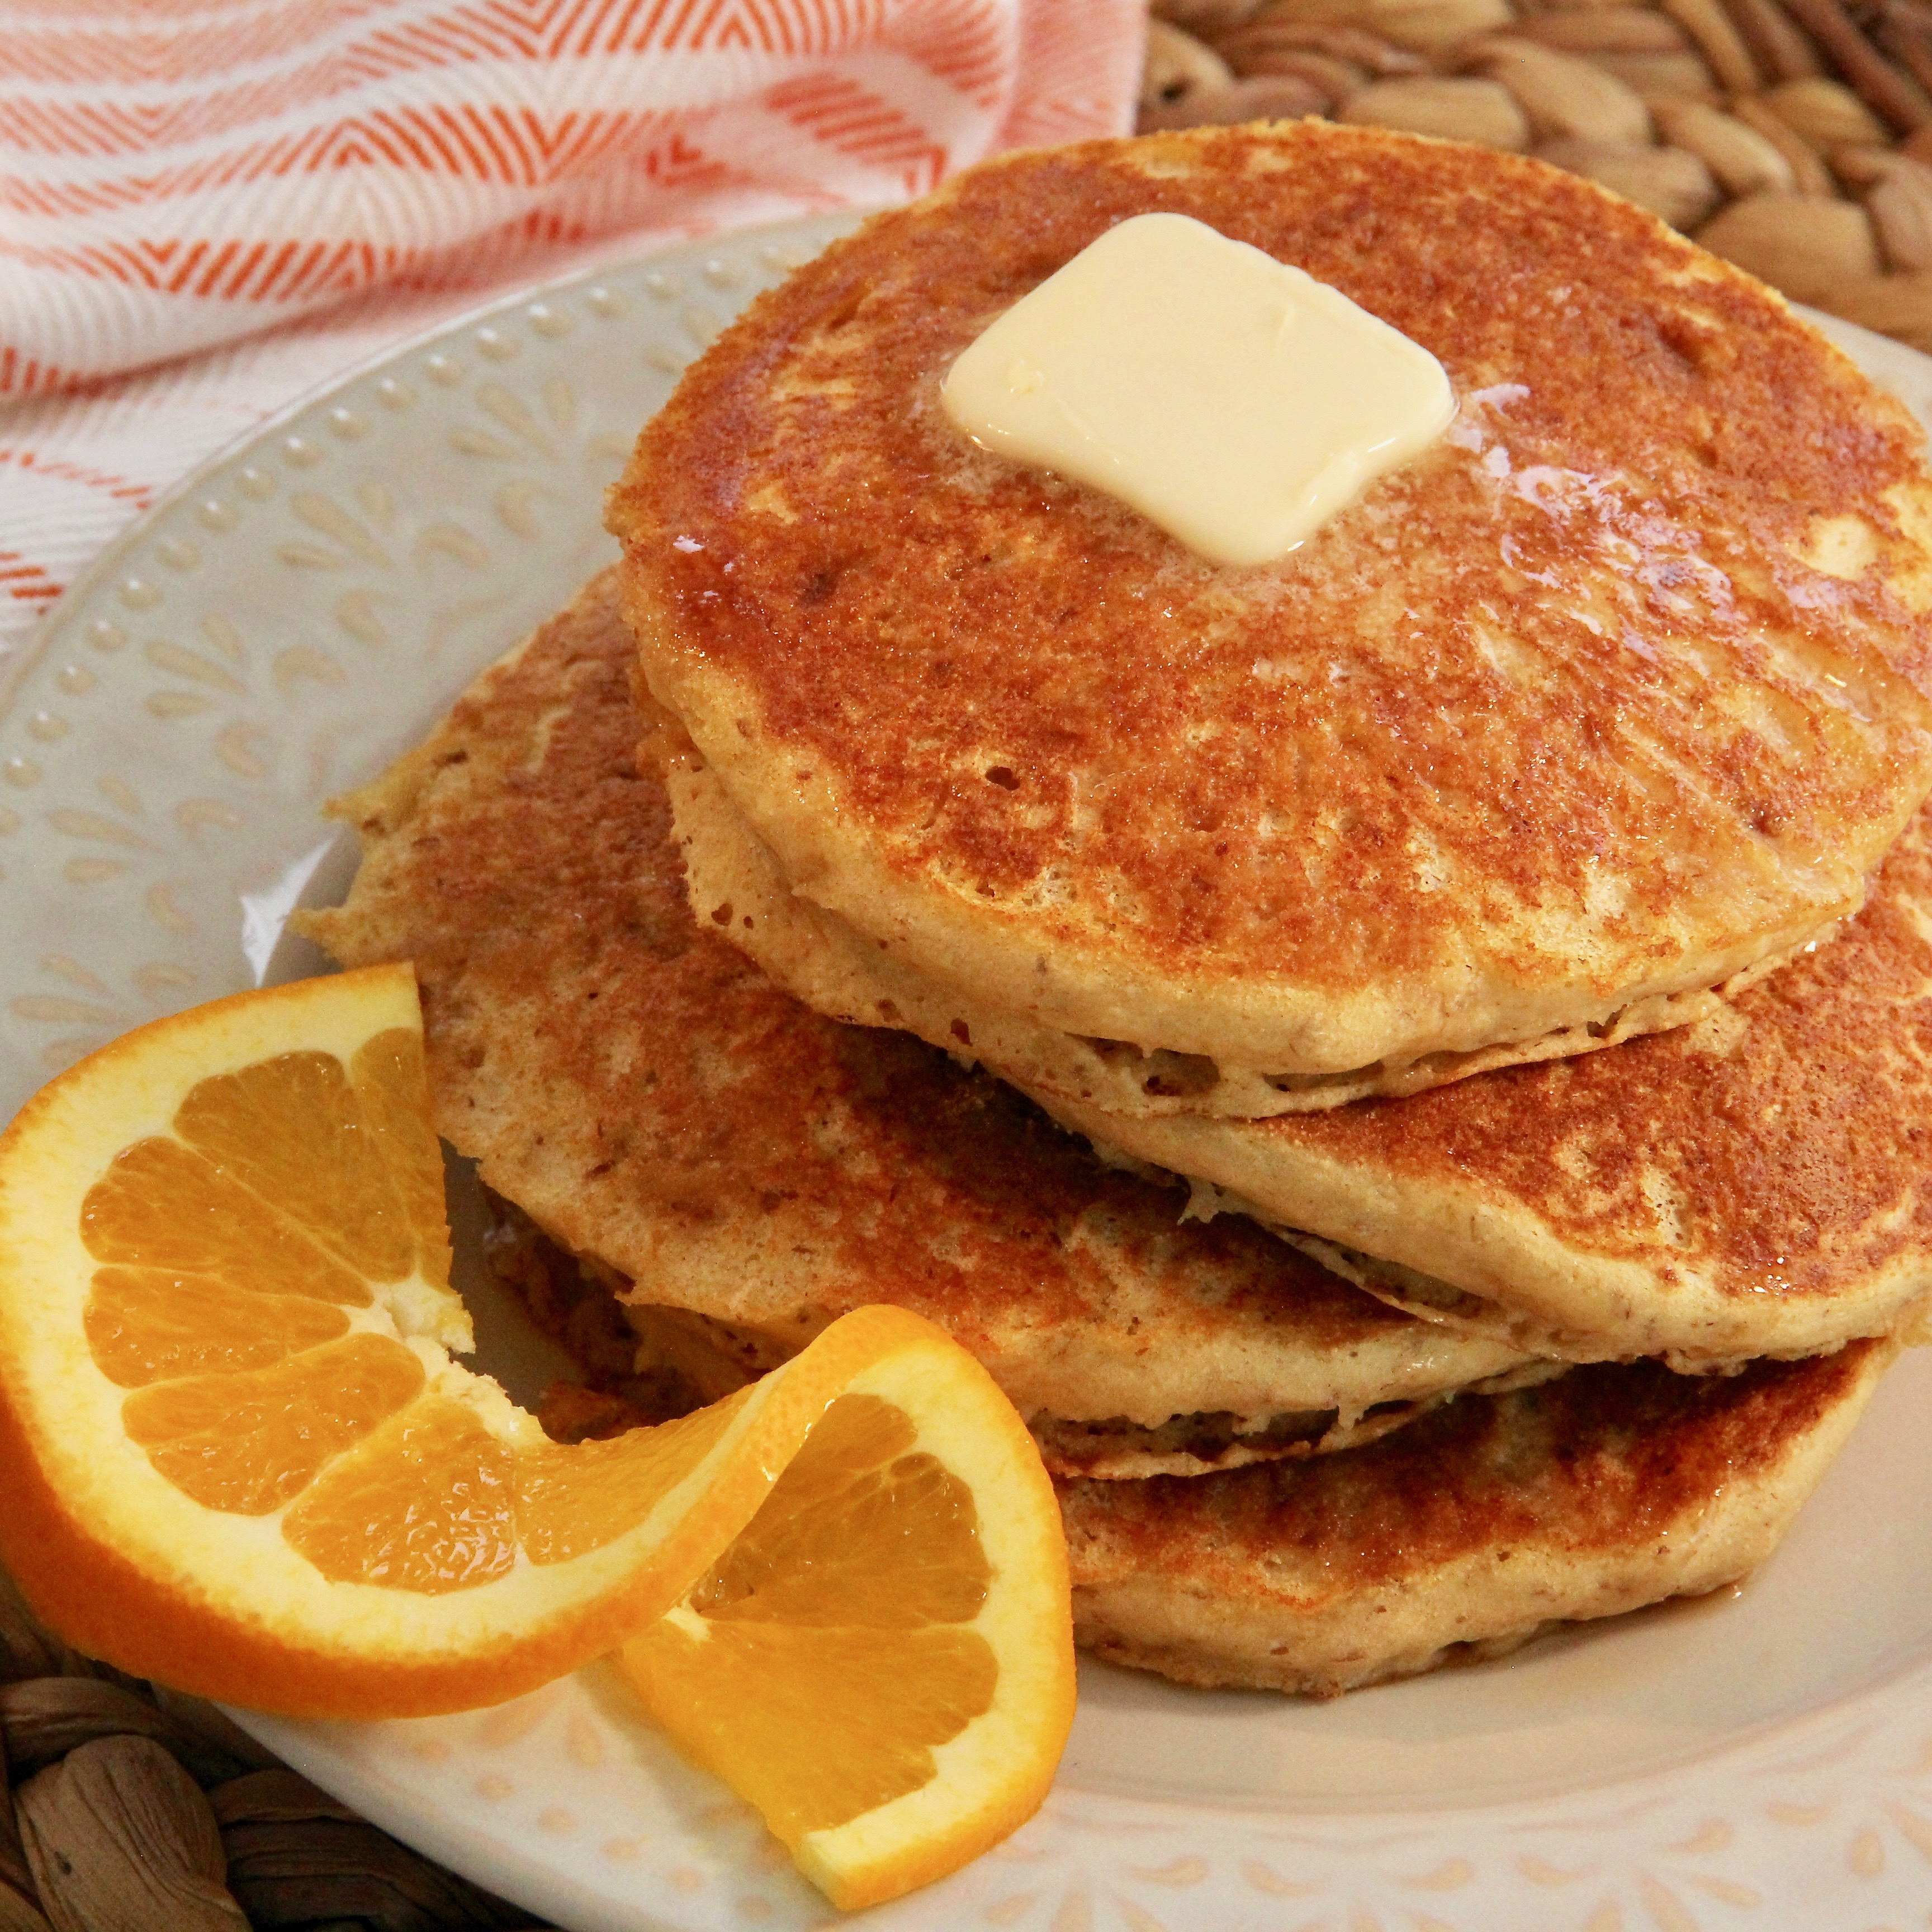 Orange Pancakes lutzflcat